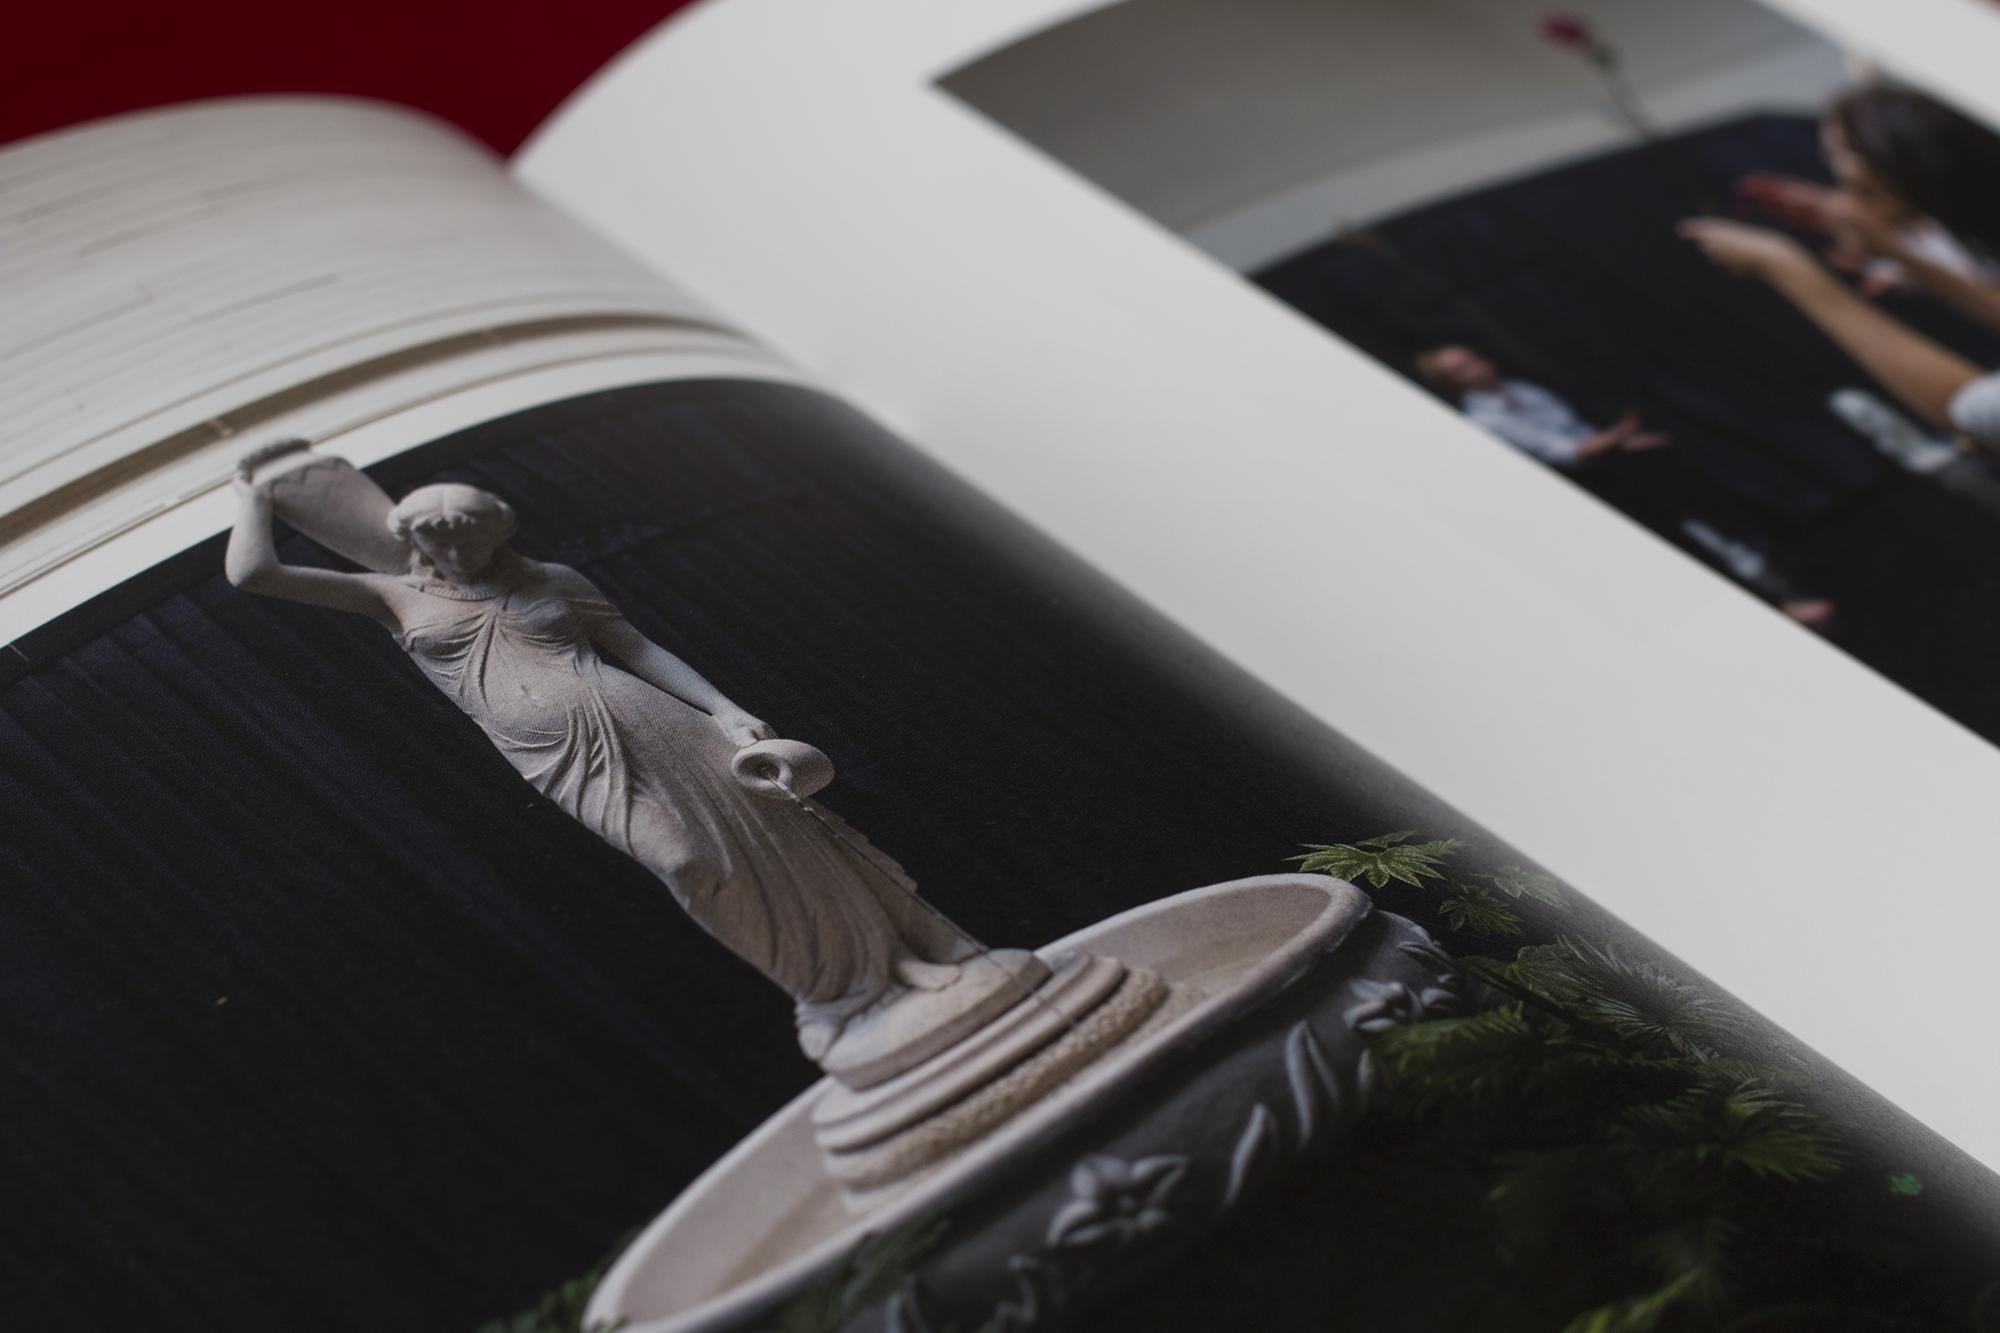 SistersAcademyBook-Agency.idoart.dk-325-2000.jpg